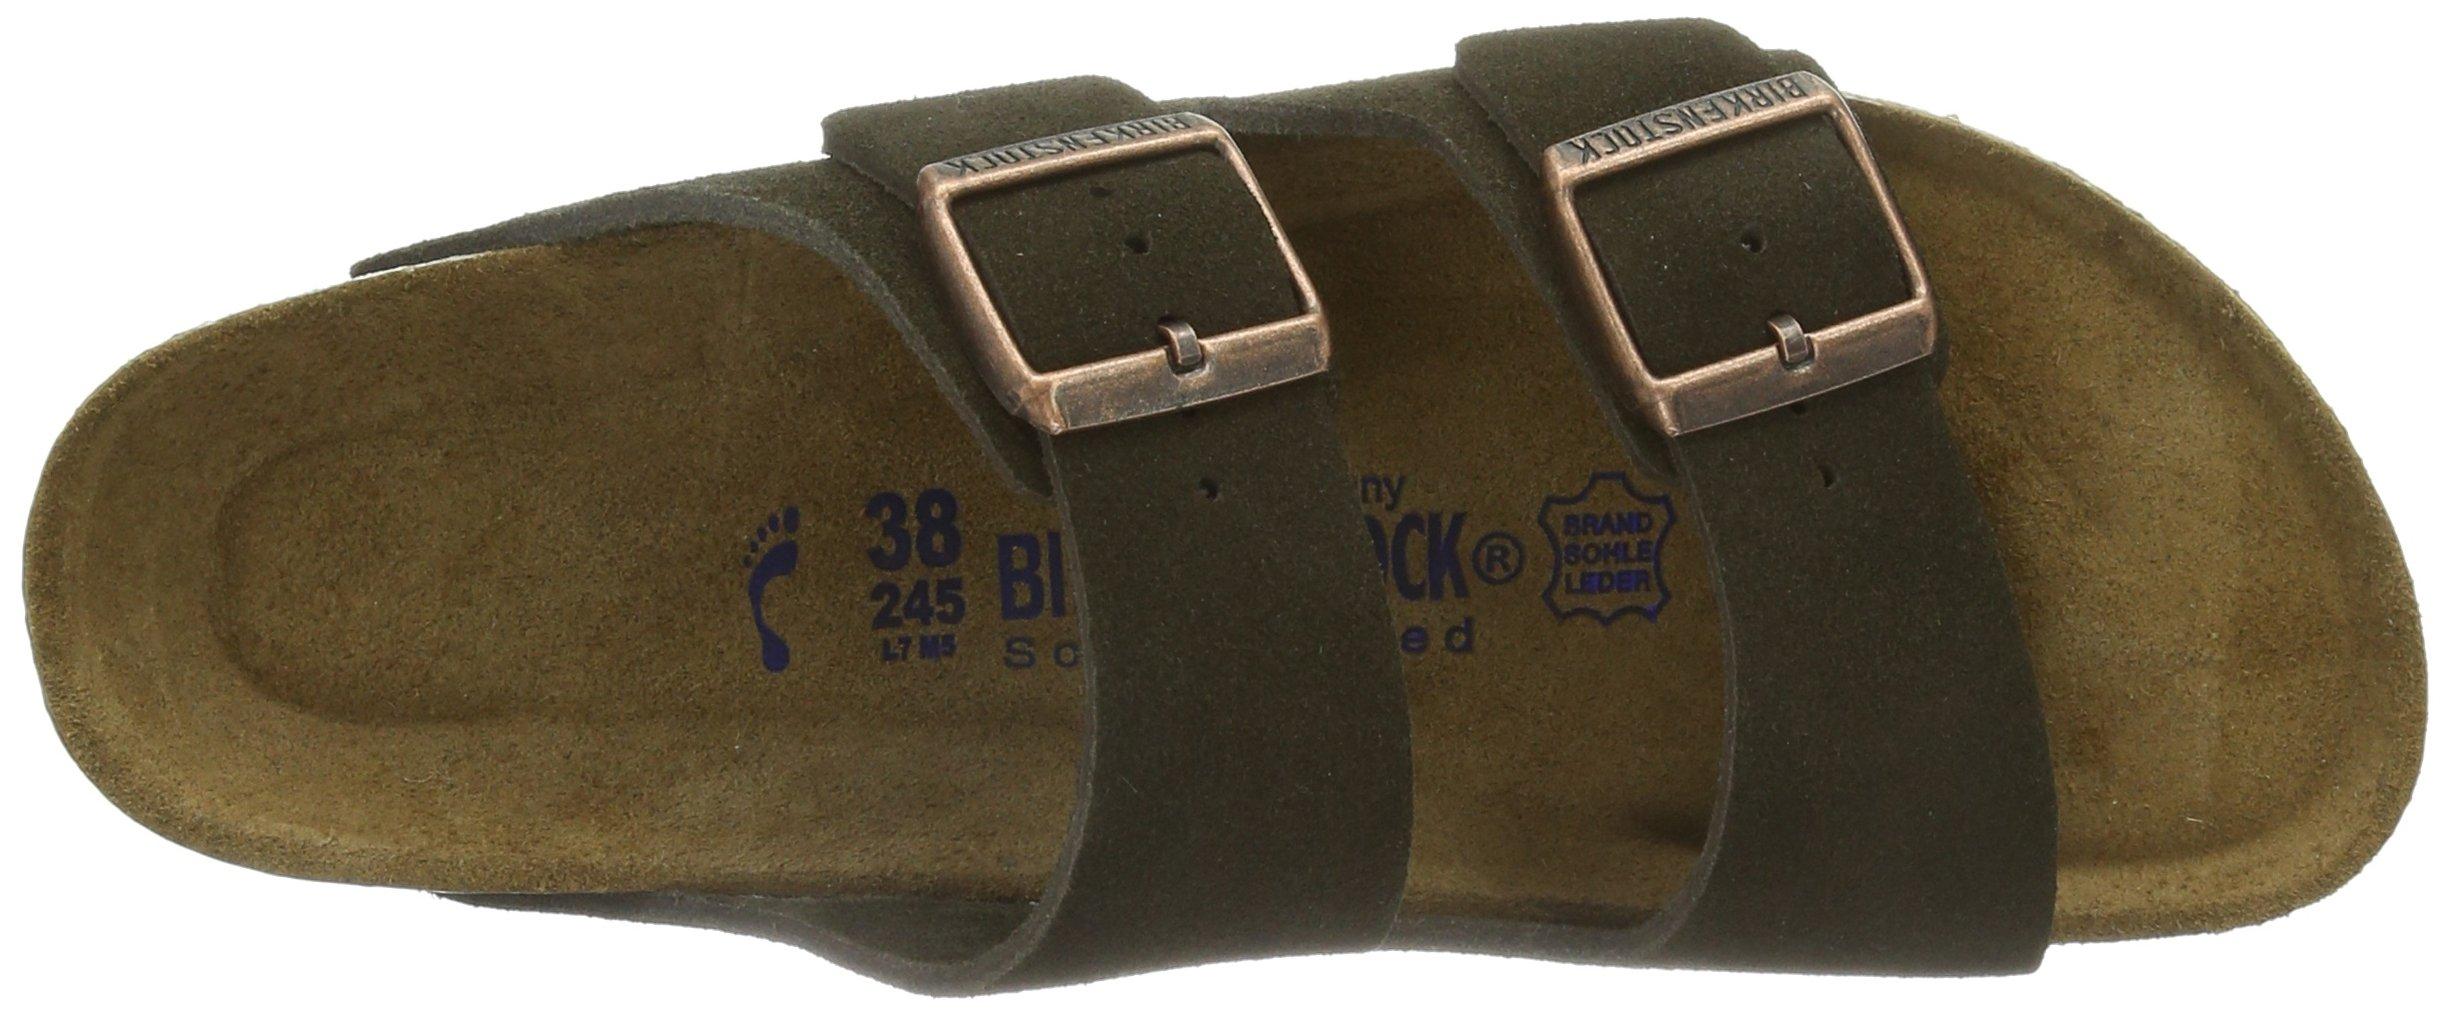 Birkenstock Women´s Arizona Mocha Suede Sandals 37 N EU N 951313 by Birkenstock (Image #7)